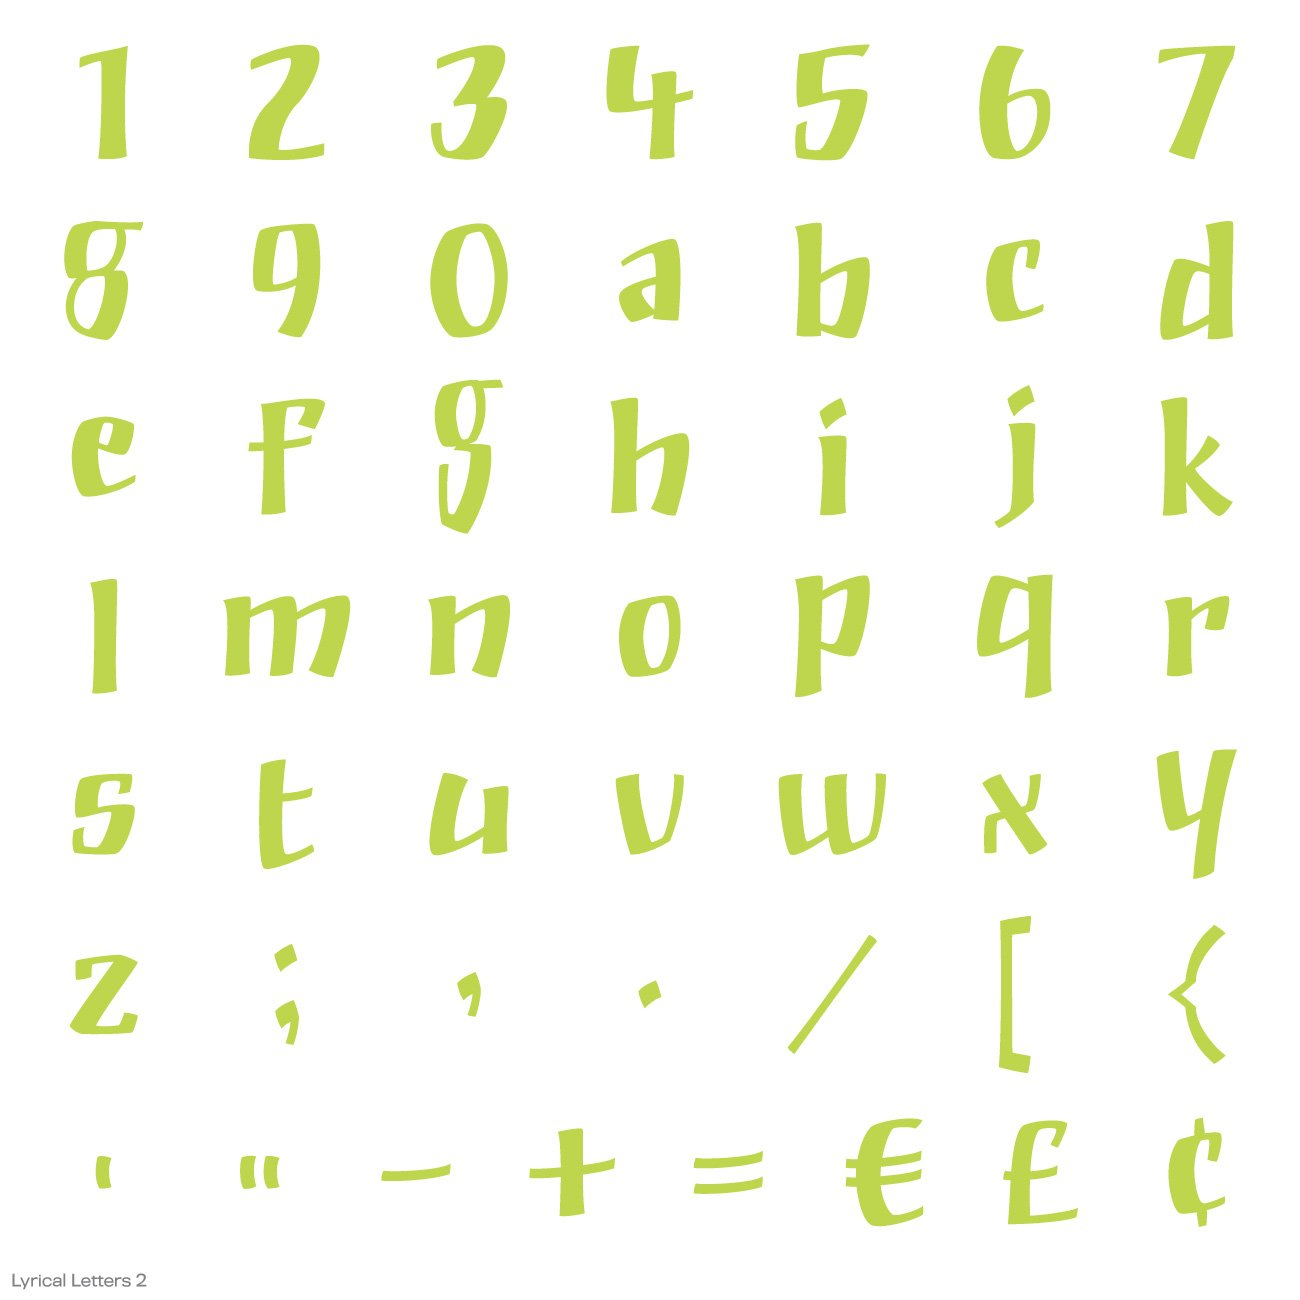 Cricut Lyrical Letters 2 Cartridge by Cricut (Image #22)